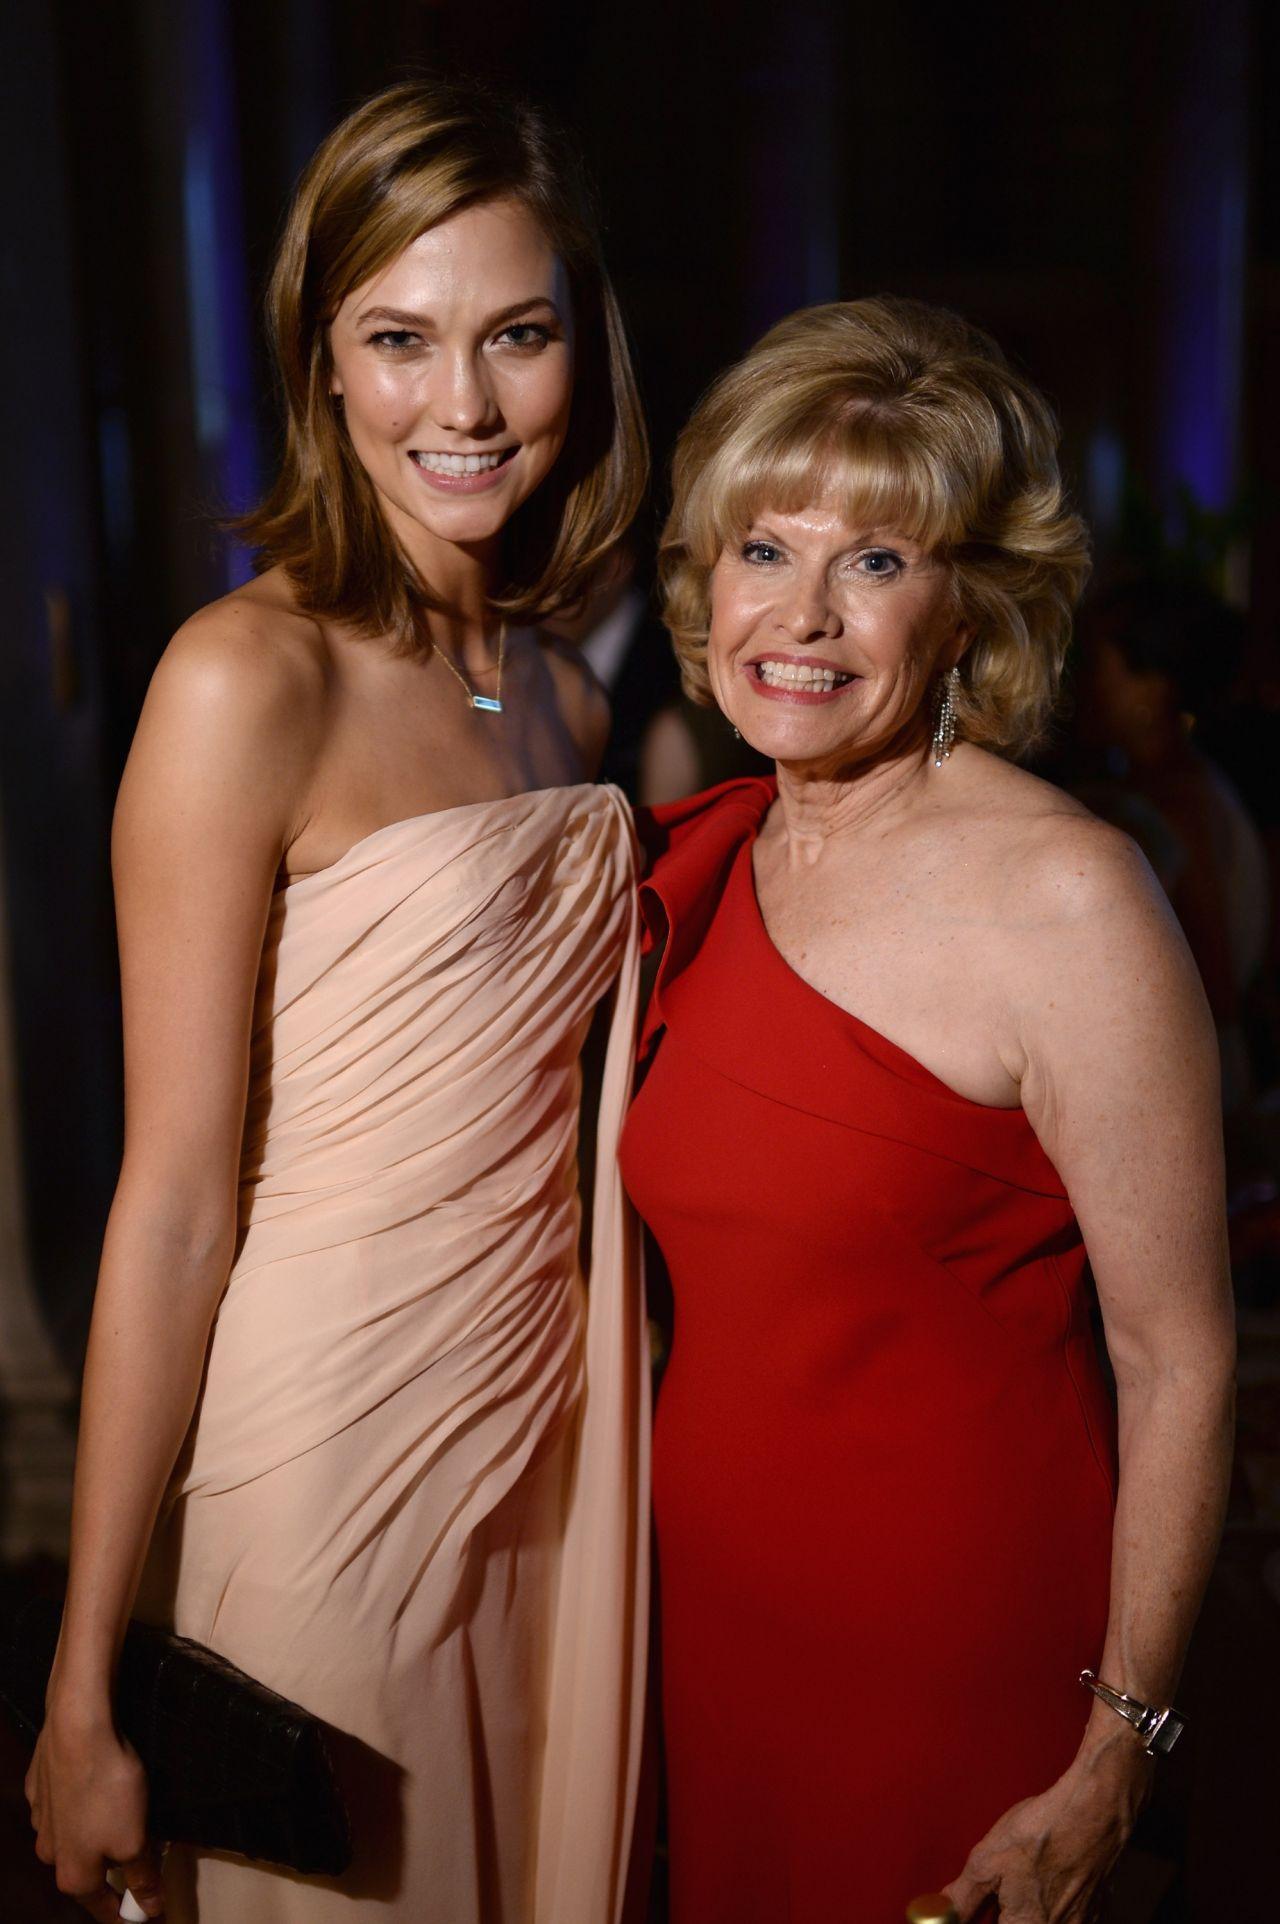 Karlie Kloss - Make-A-Wish Metro New York Annual Gala - June 2014